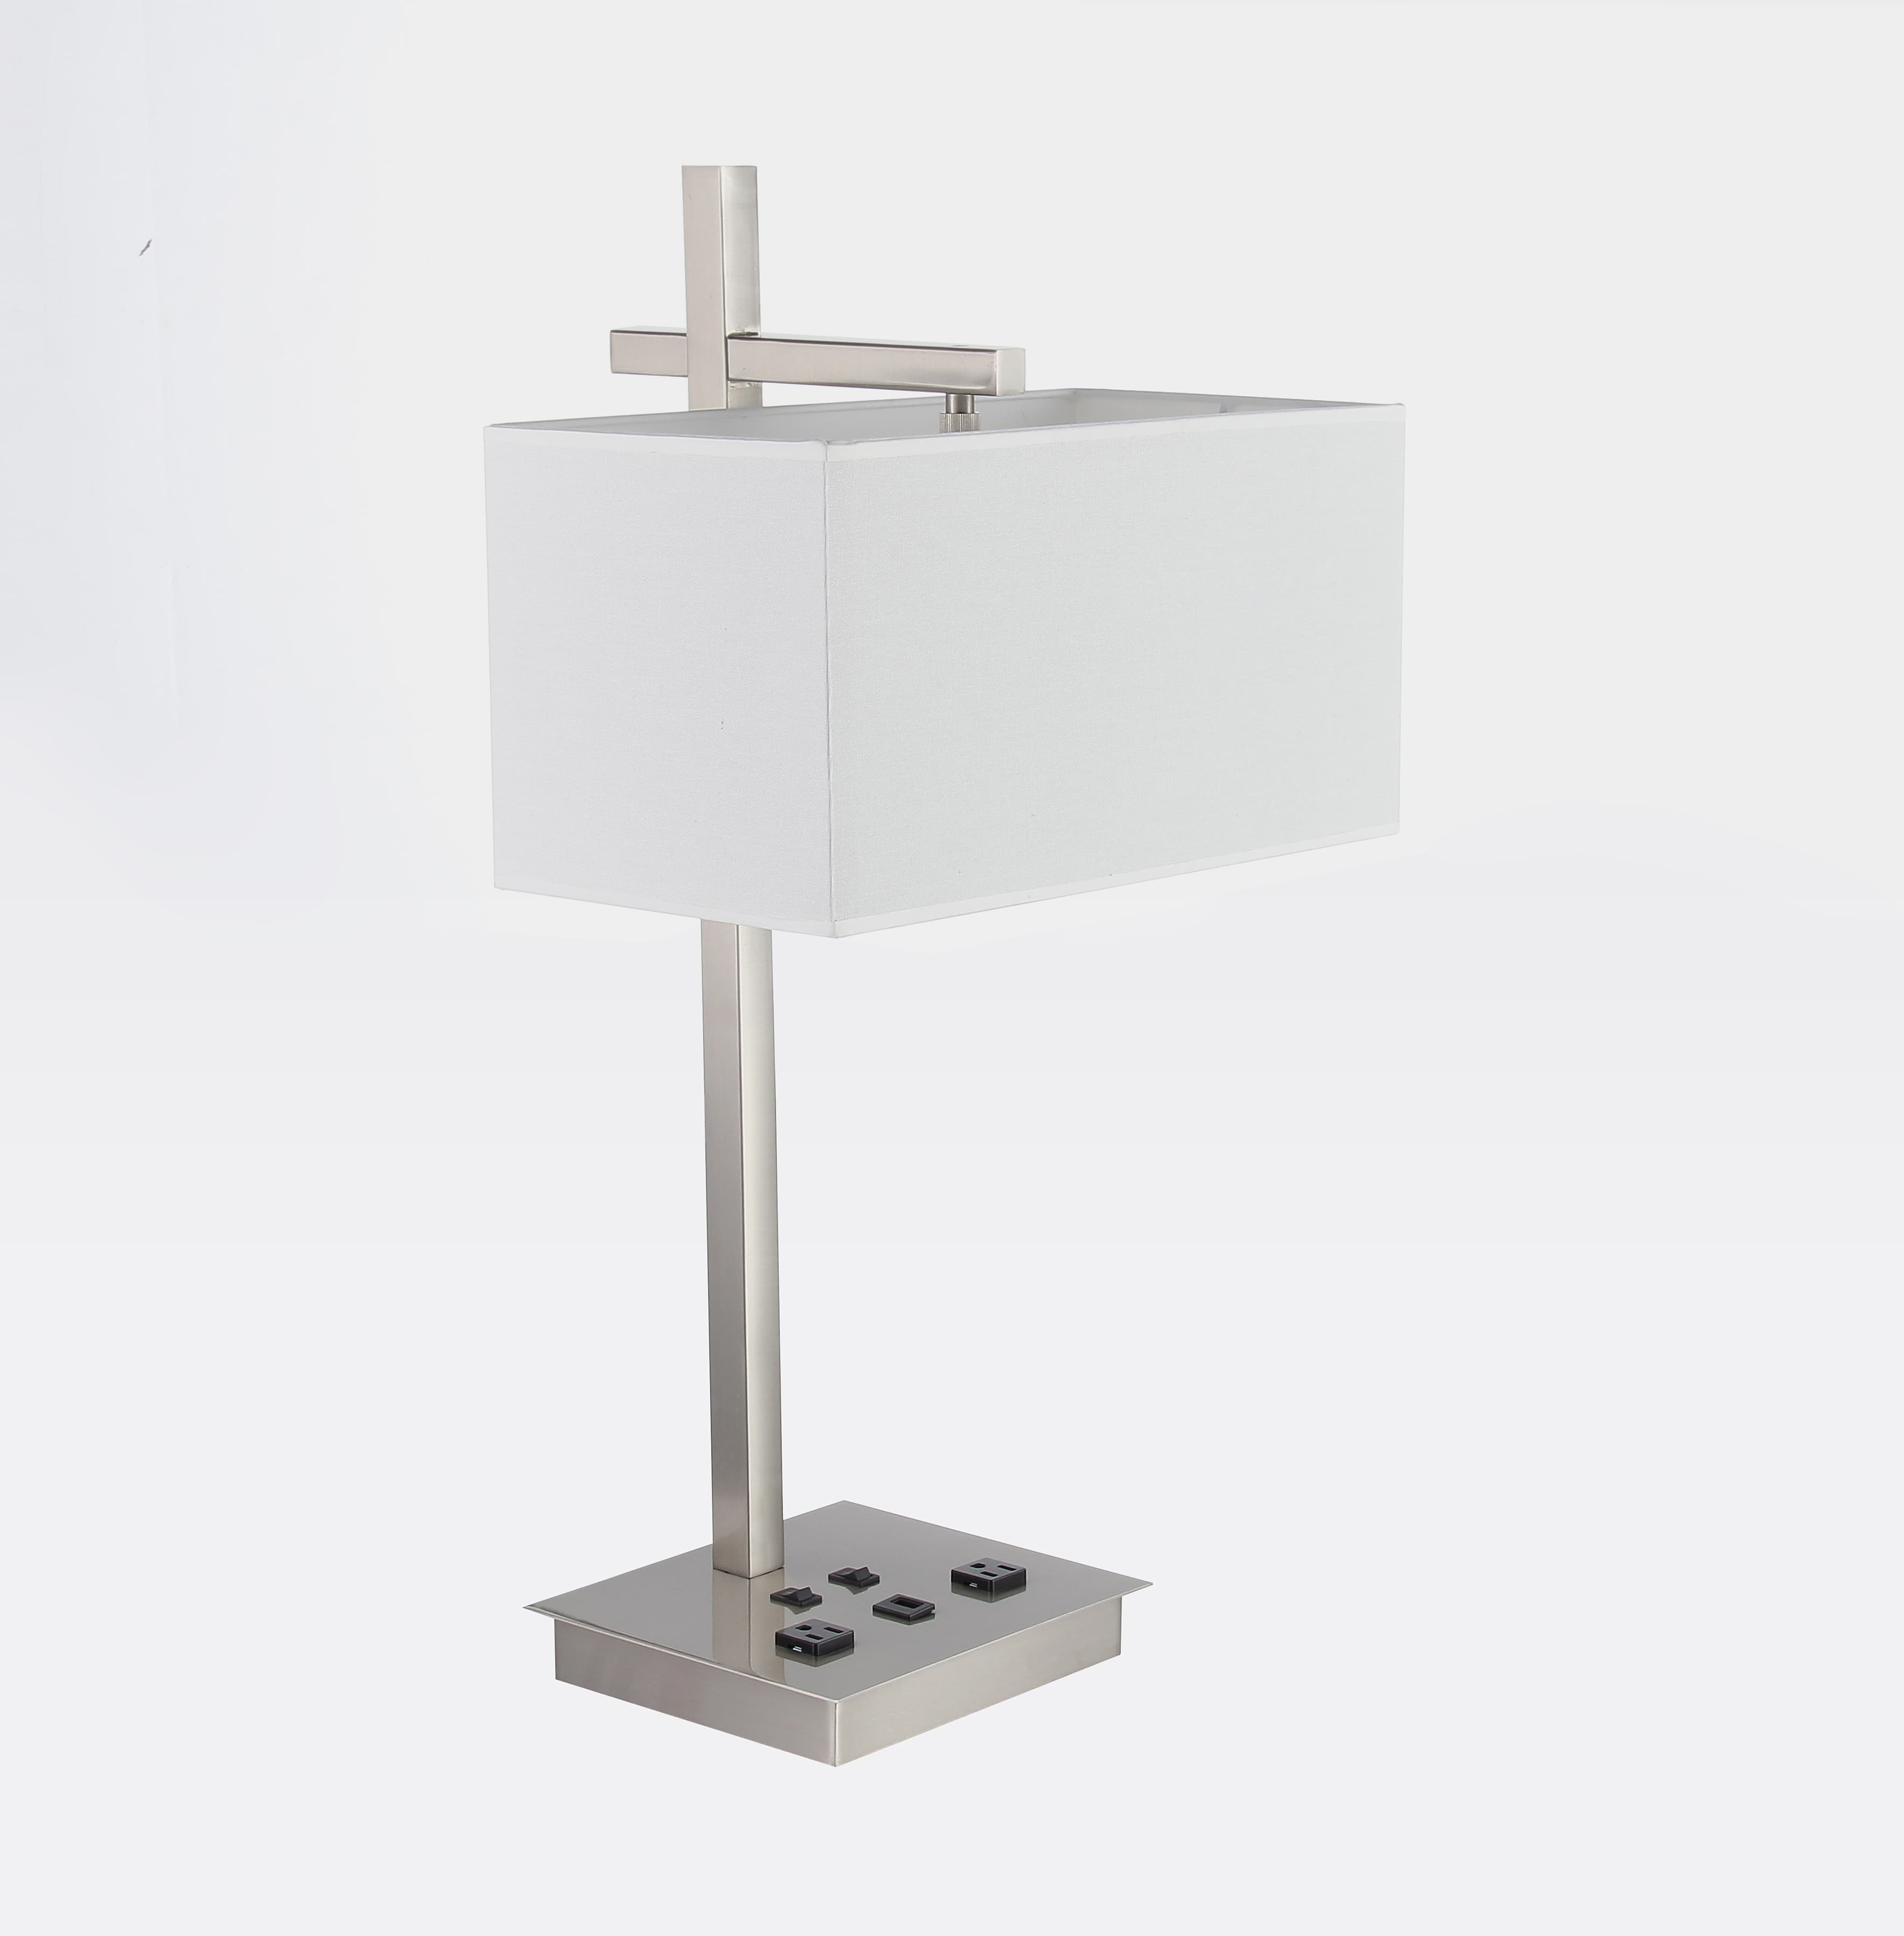 Desk Lamp with 2 Elec/1 USB